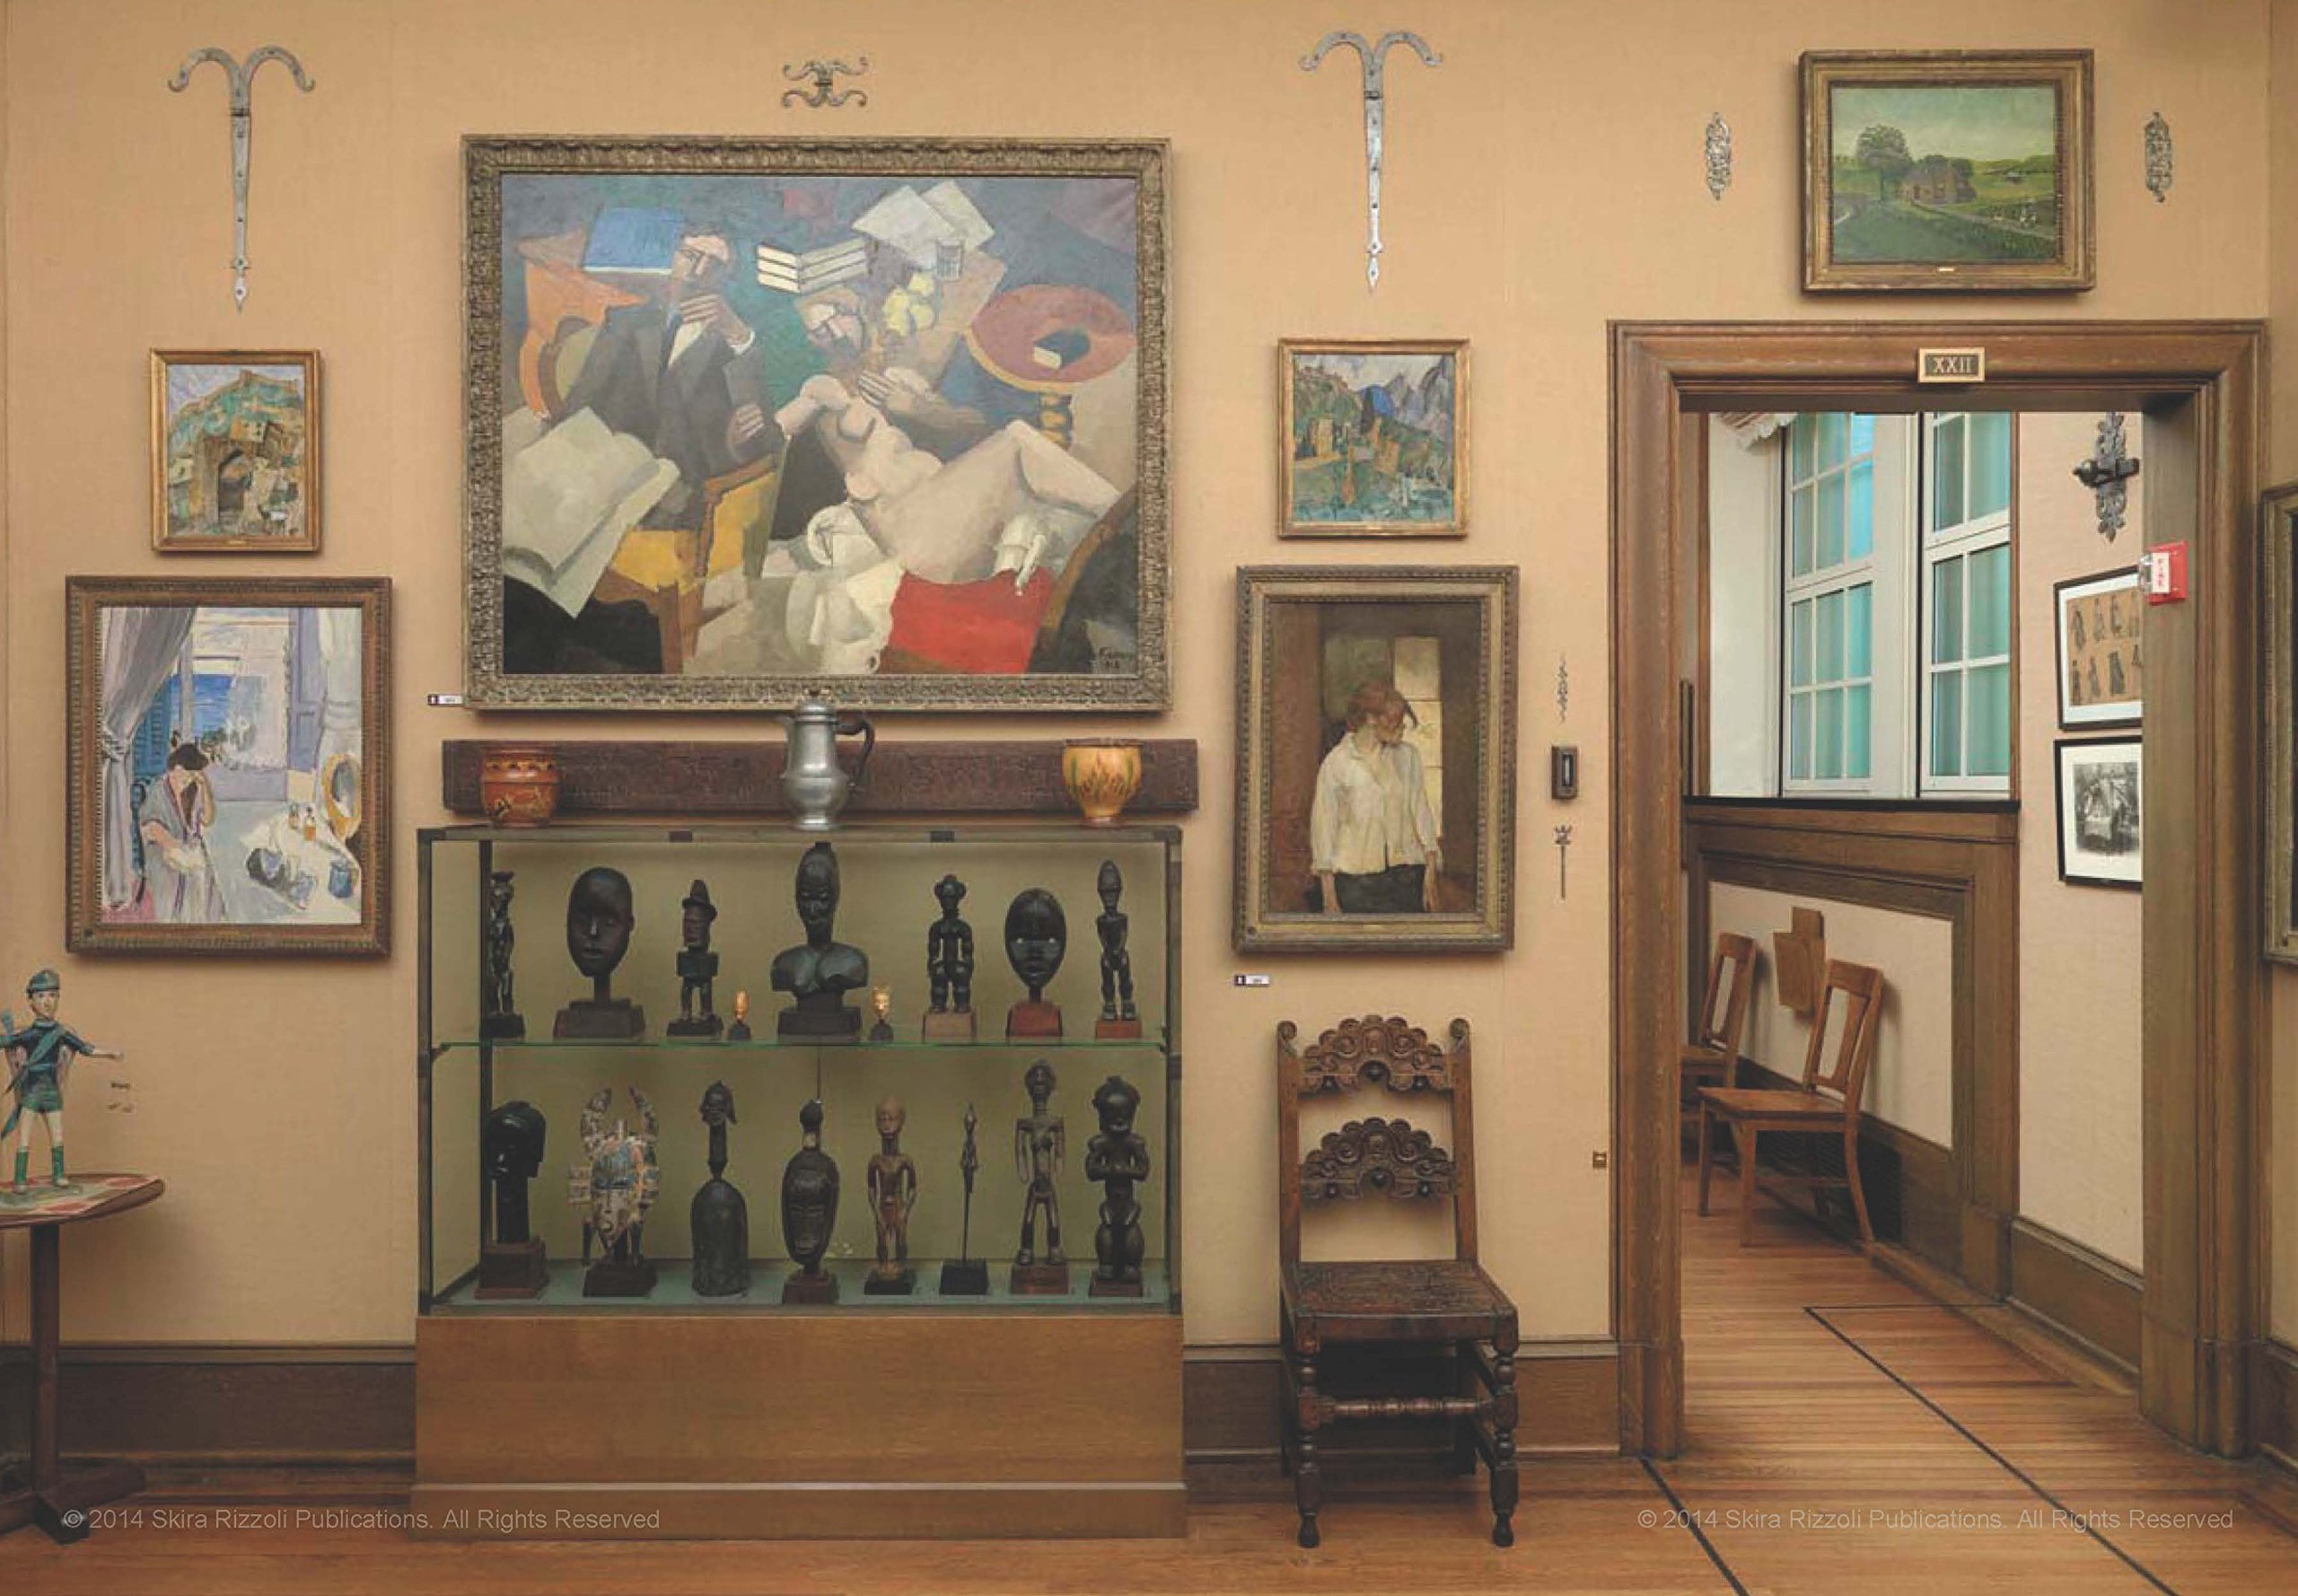 Barnes 3 African Art between Matisse and Tolouse Lautrec